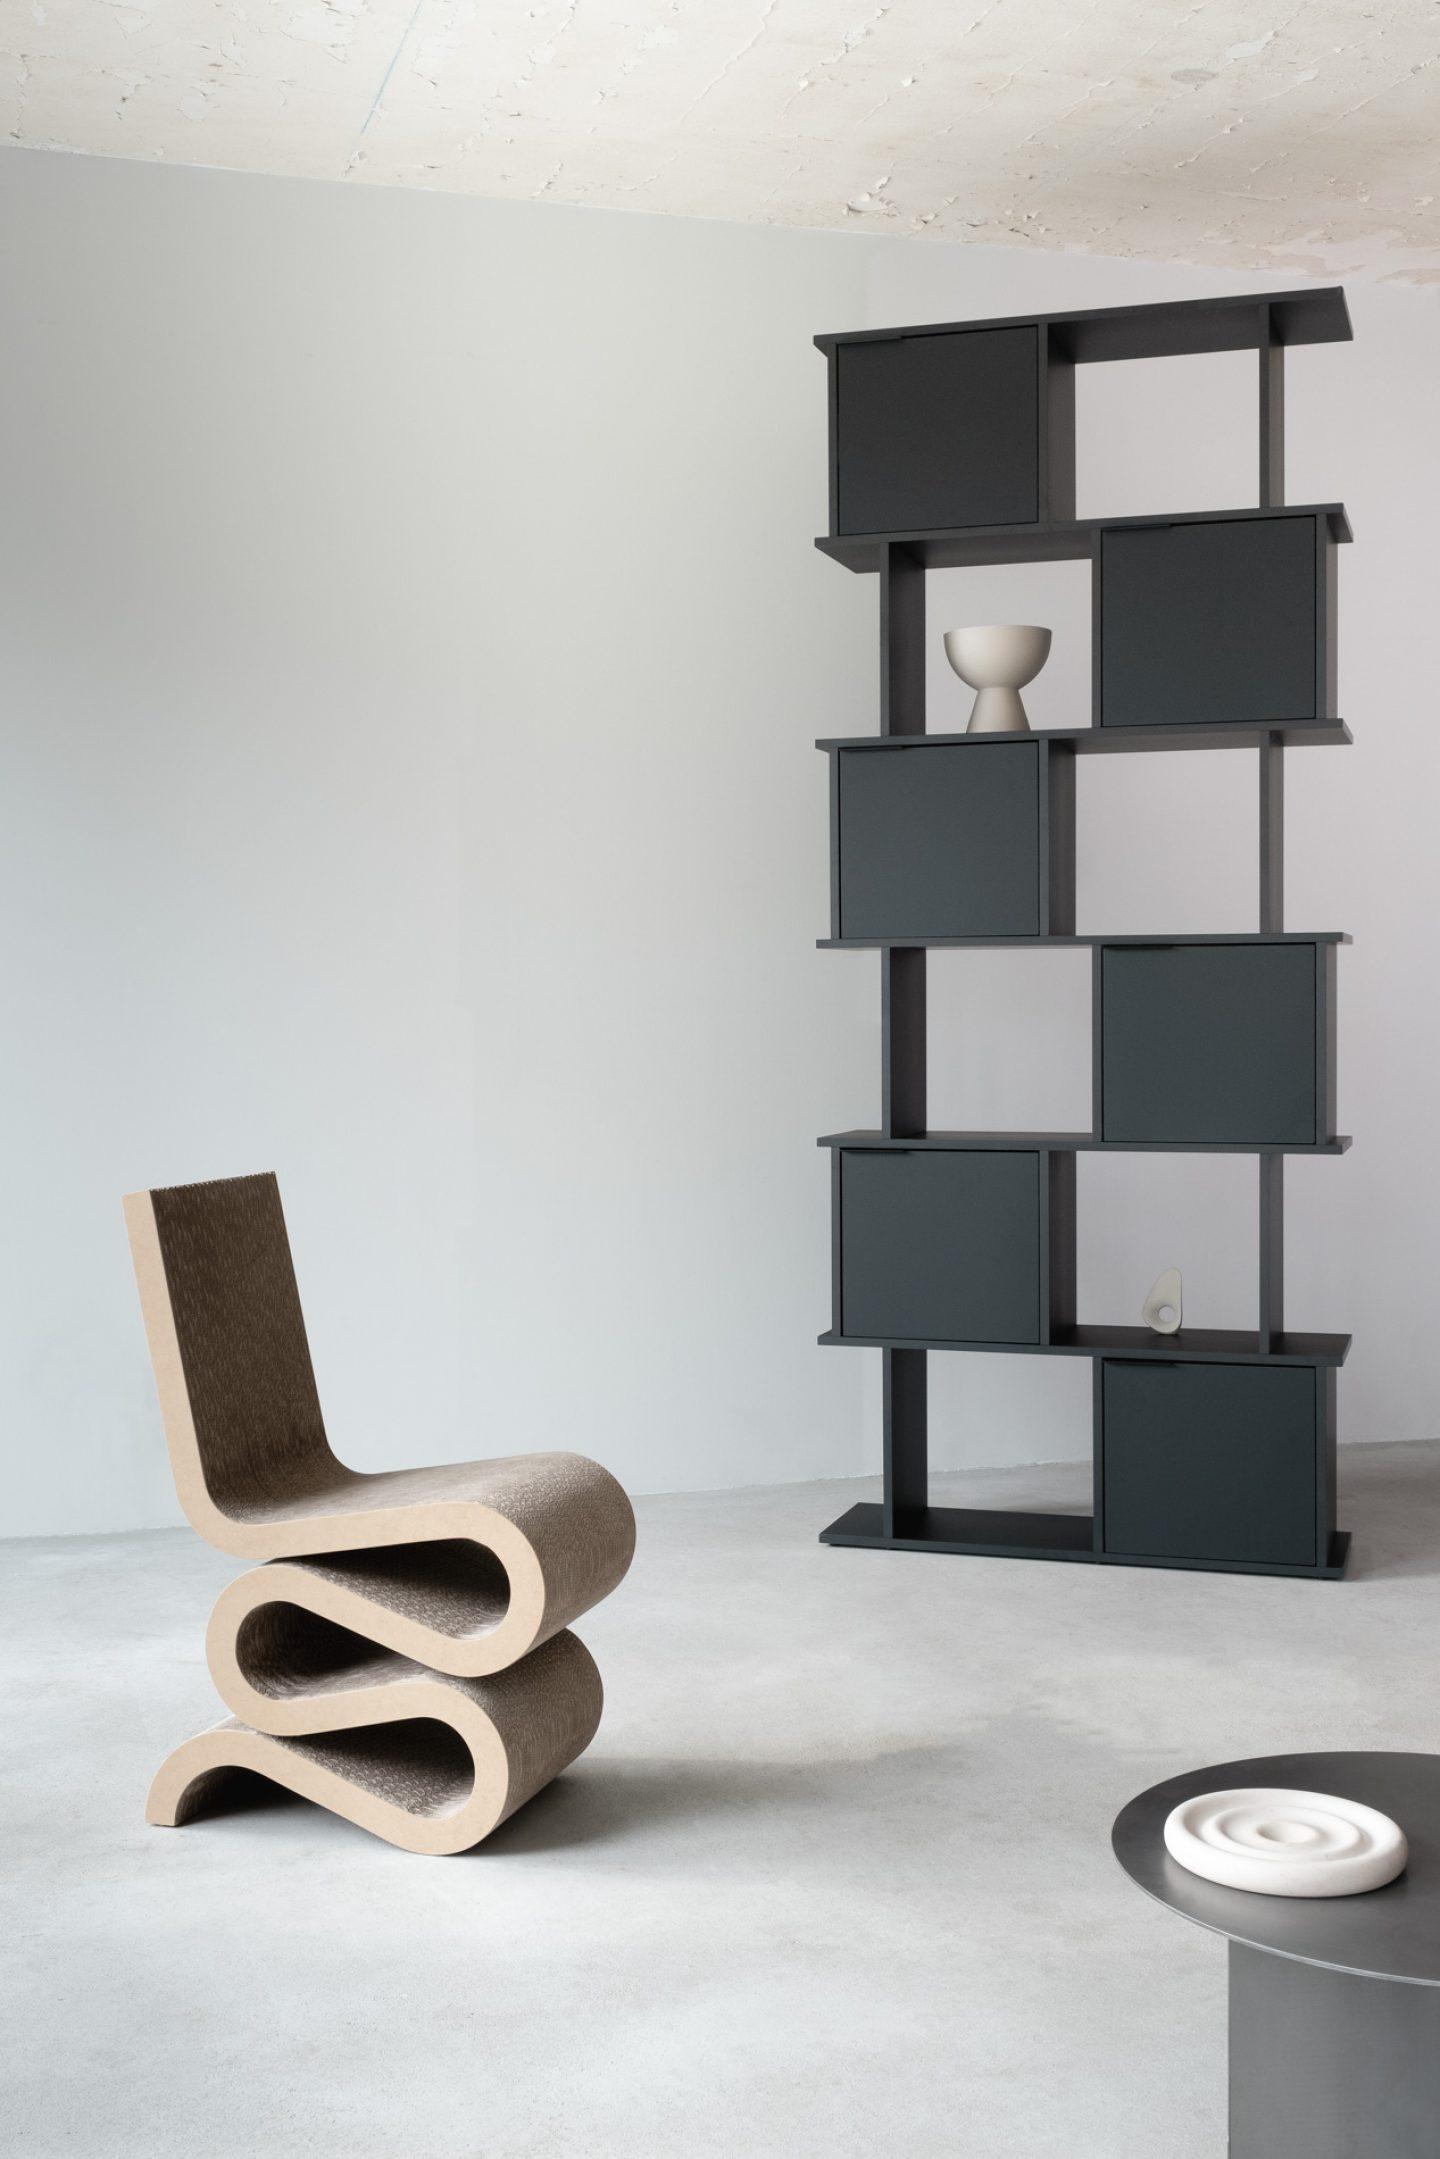 IGNANT-Tylko-shelf-design-Clemens-Poloczek--7